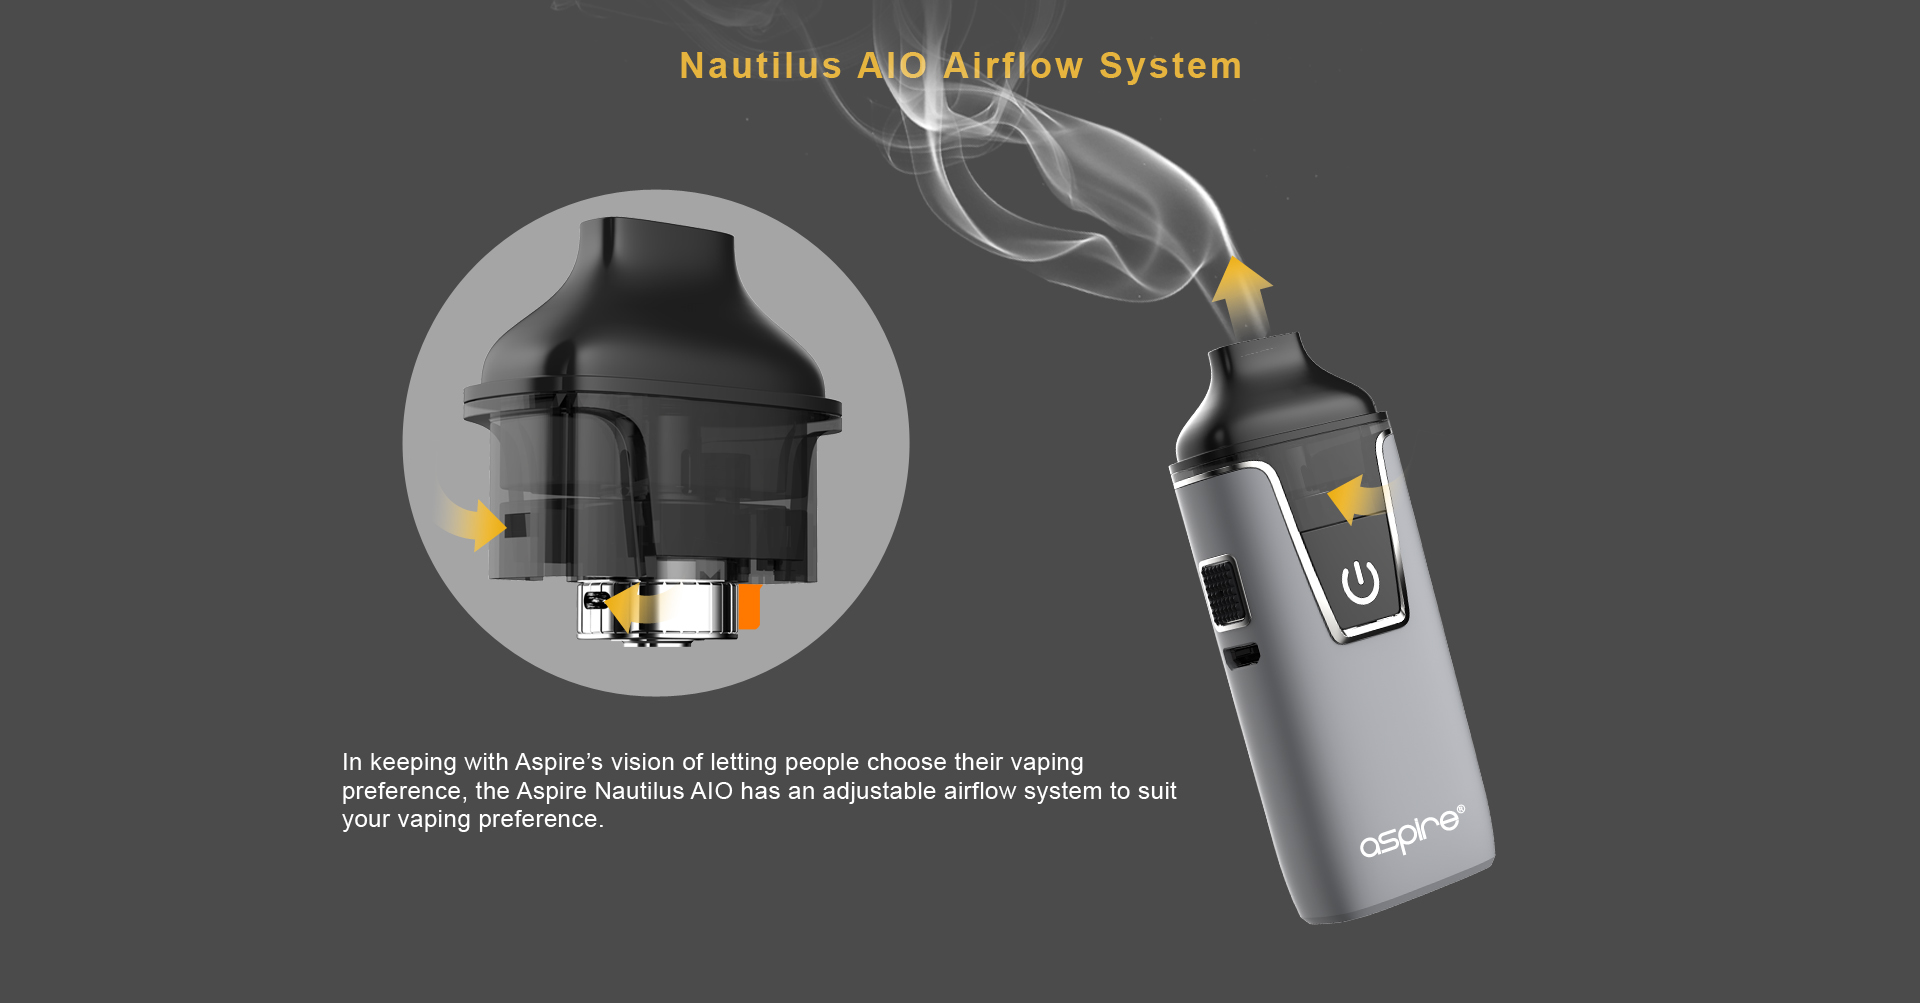 Nautilus AIO airflow system